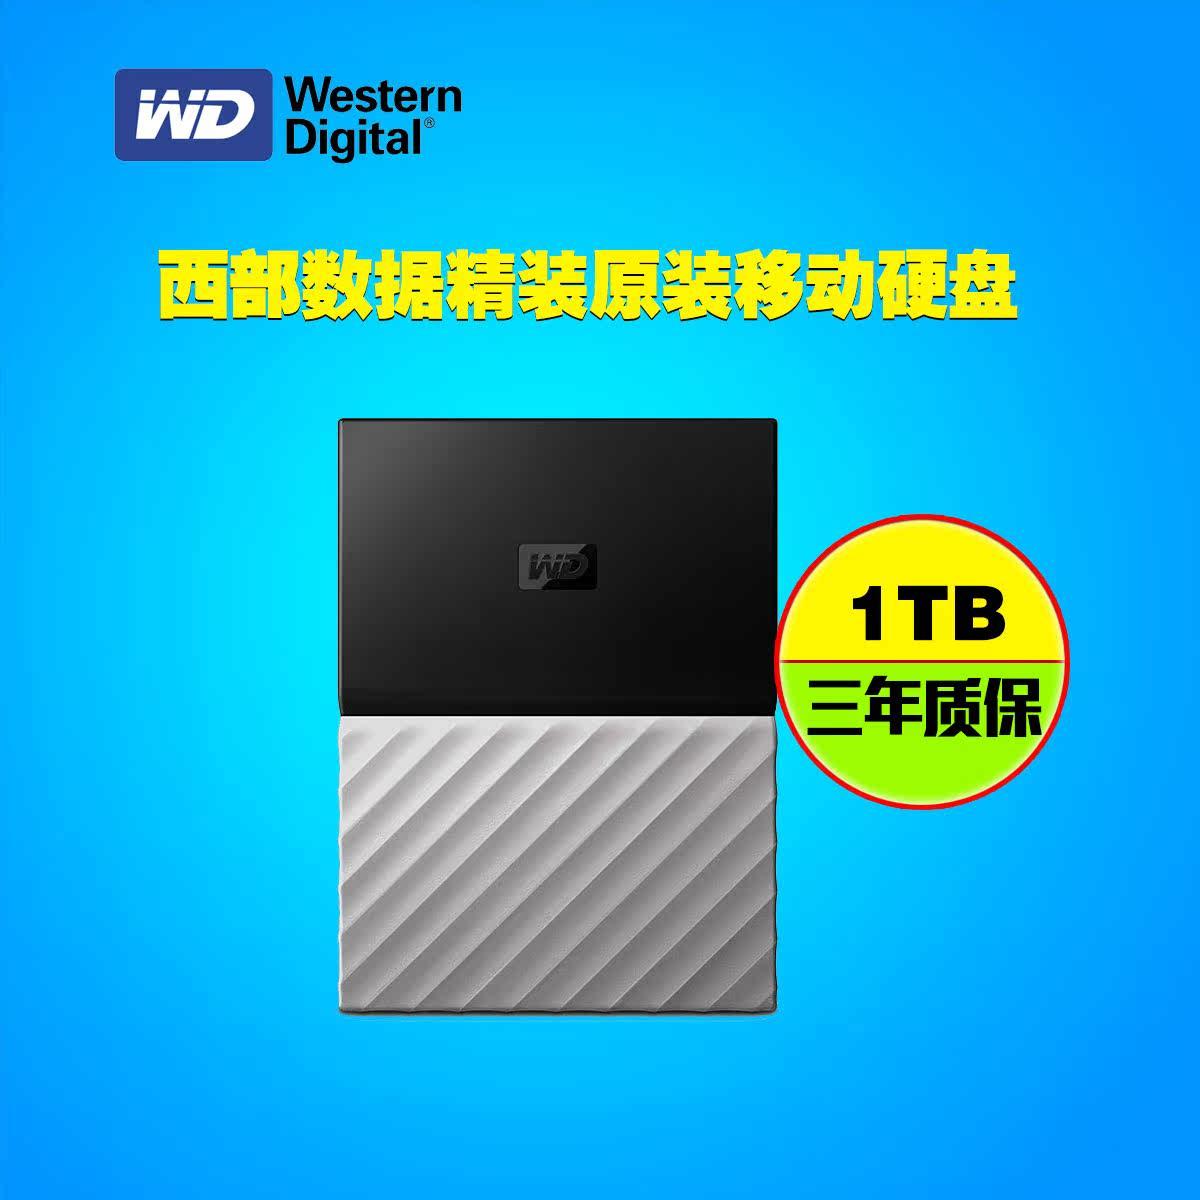 Western Digital (WD) MyPassportUltra1TB2.5 cm hardcover - mobile festplatte usb3.0